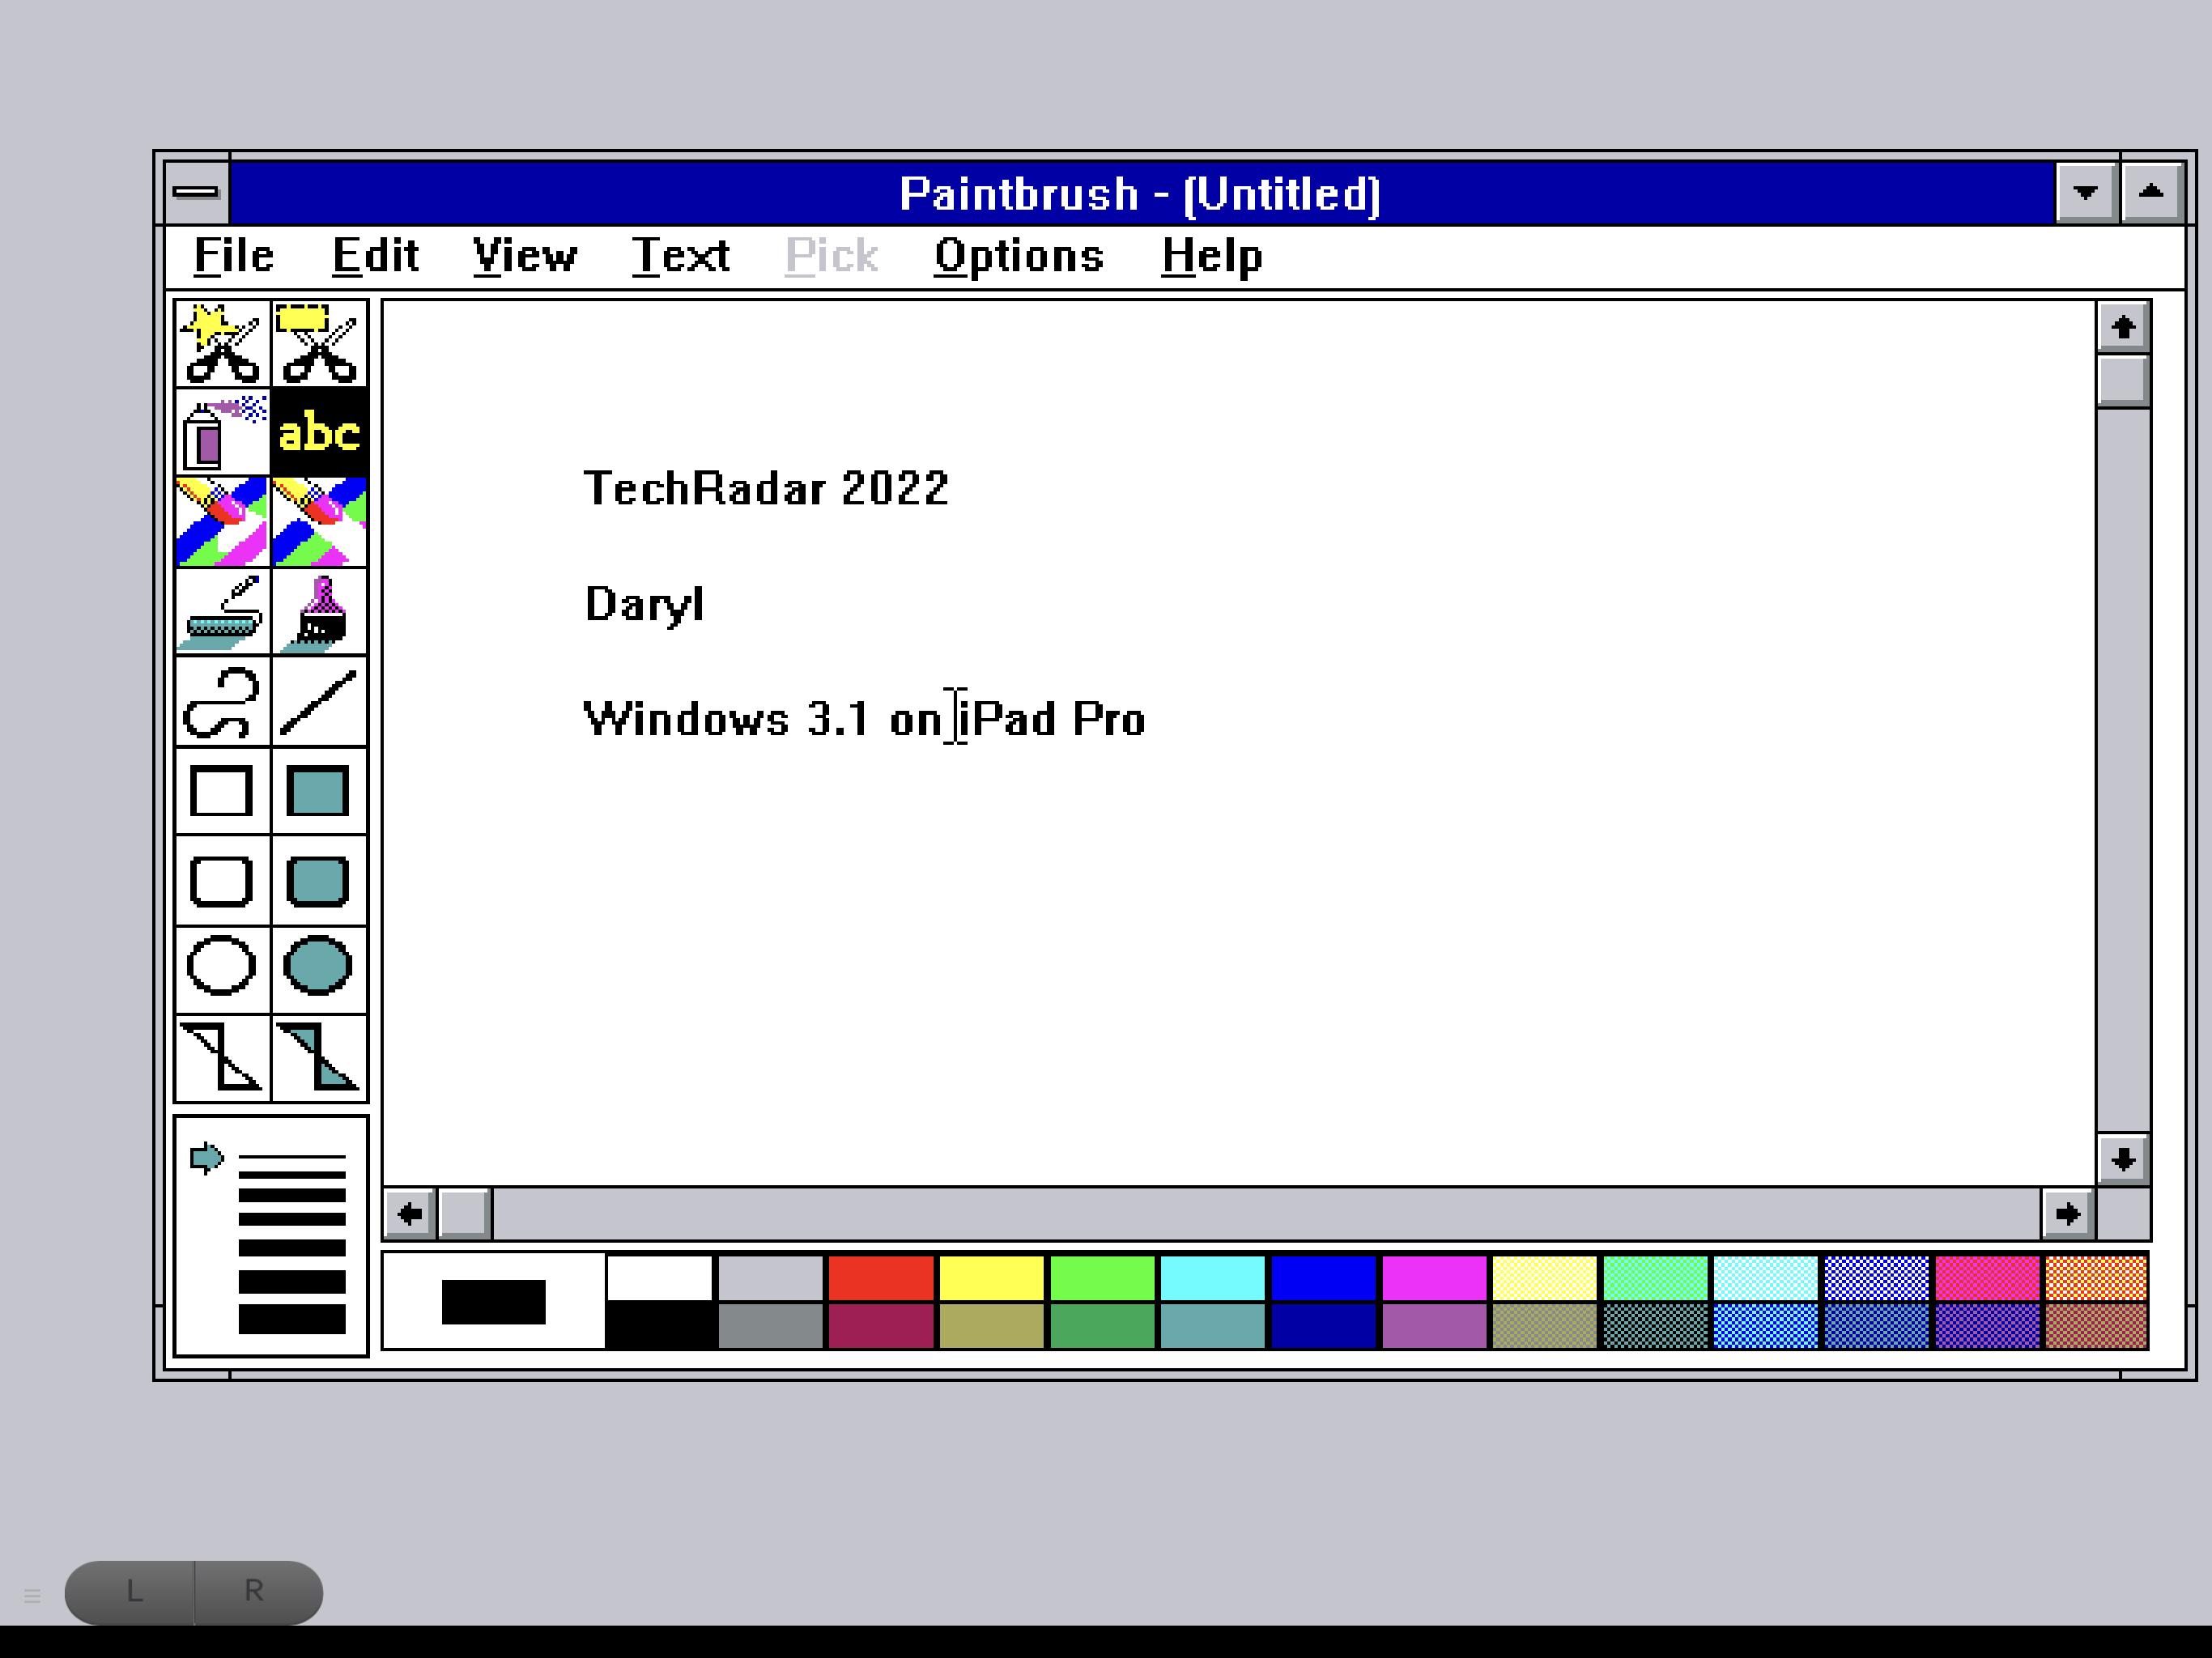 Windows 3.1 ejecutándose en iPad Pro, usando PaintBrush